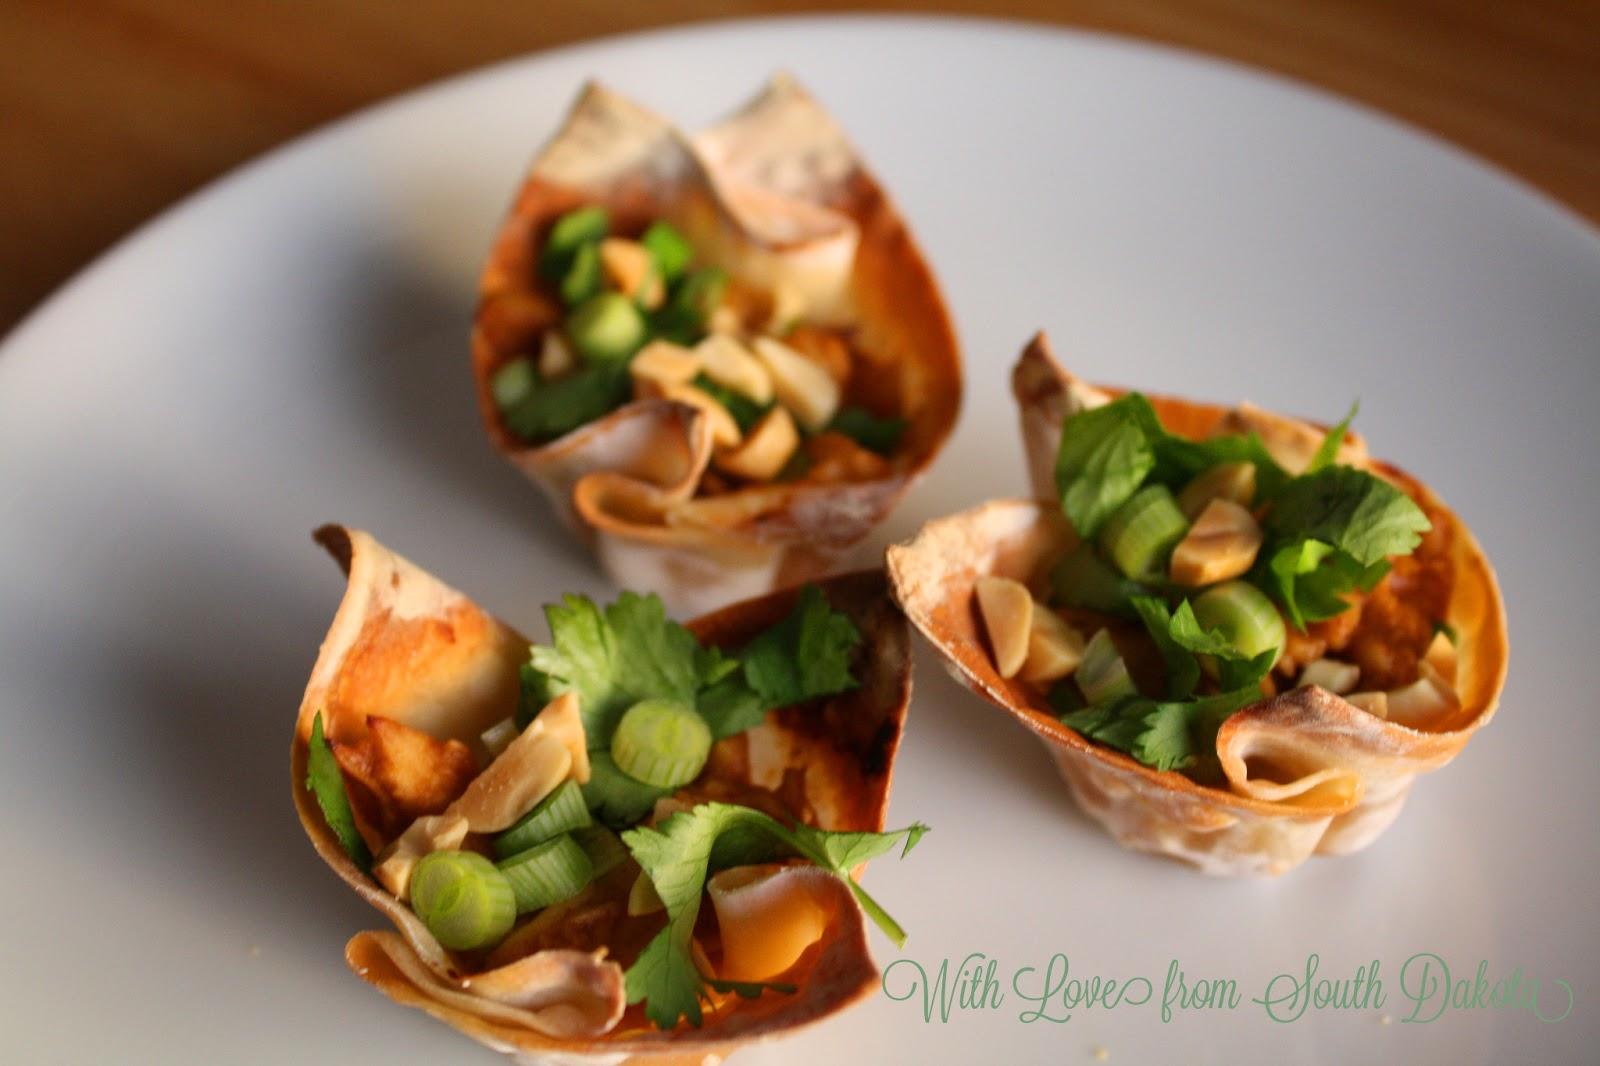 Spicy Peanut Chicken Cups + Crunchy Lettuce Toss